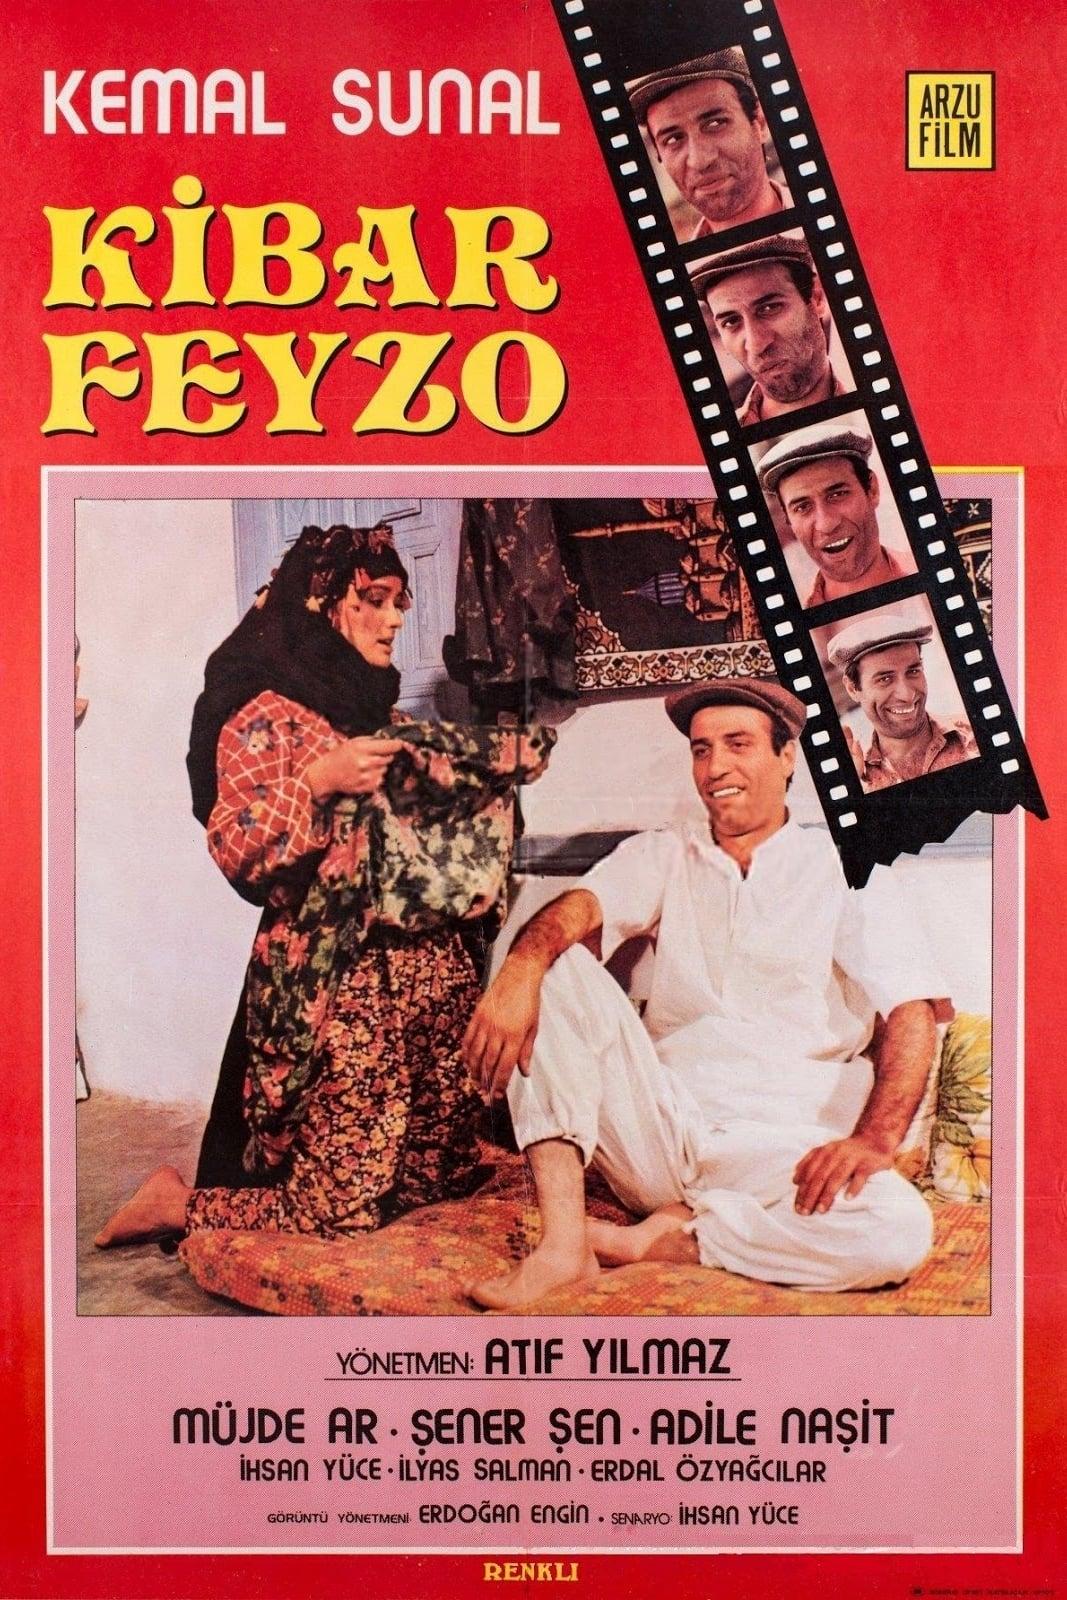 Feyzo, the Polite One (1978)